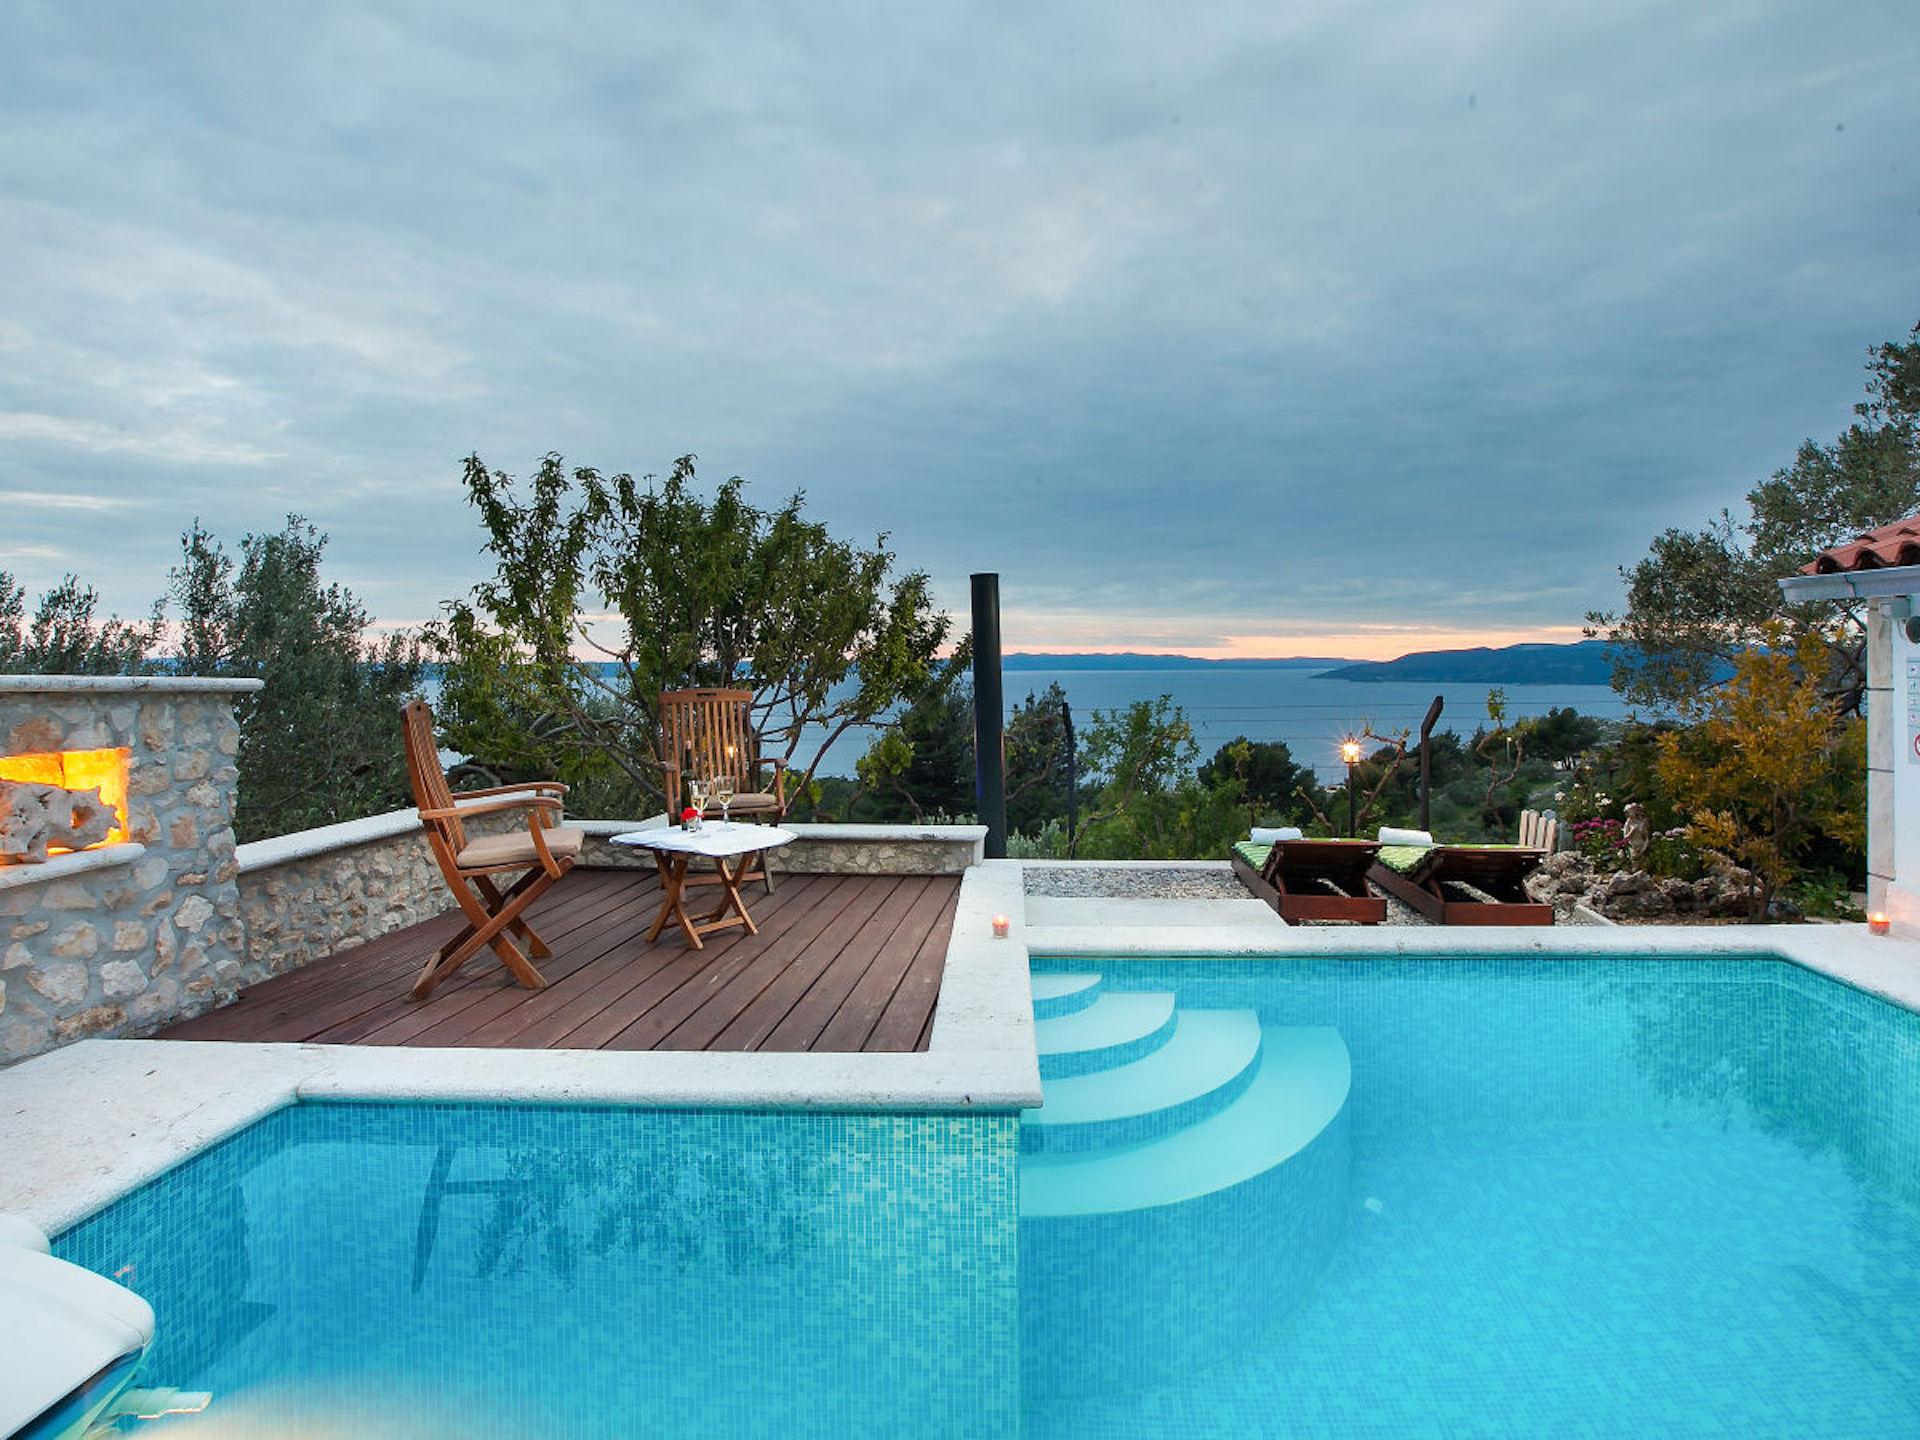 2a ferienhaus dalmatien mit pool villa dalmatia with pool and sea view. Black Bedroom Furniture Sets. Home Design Ideas